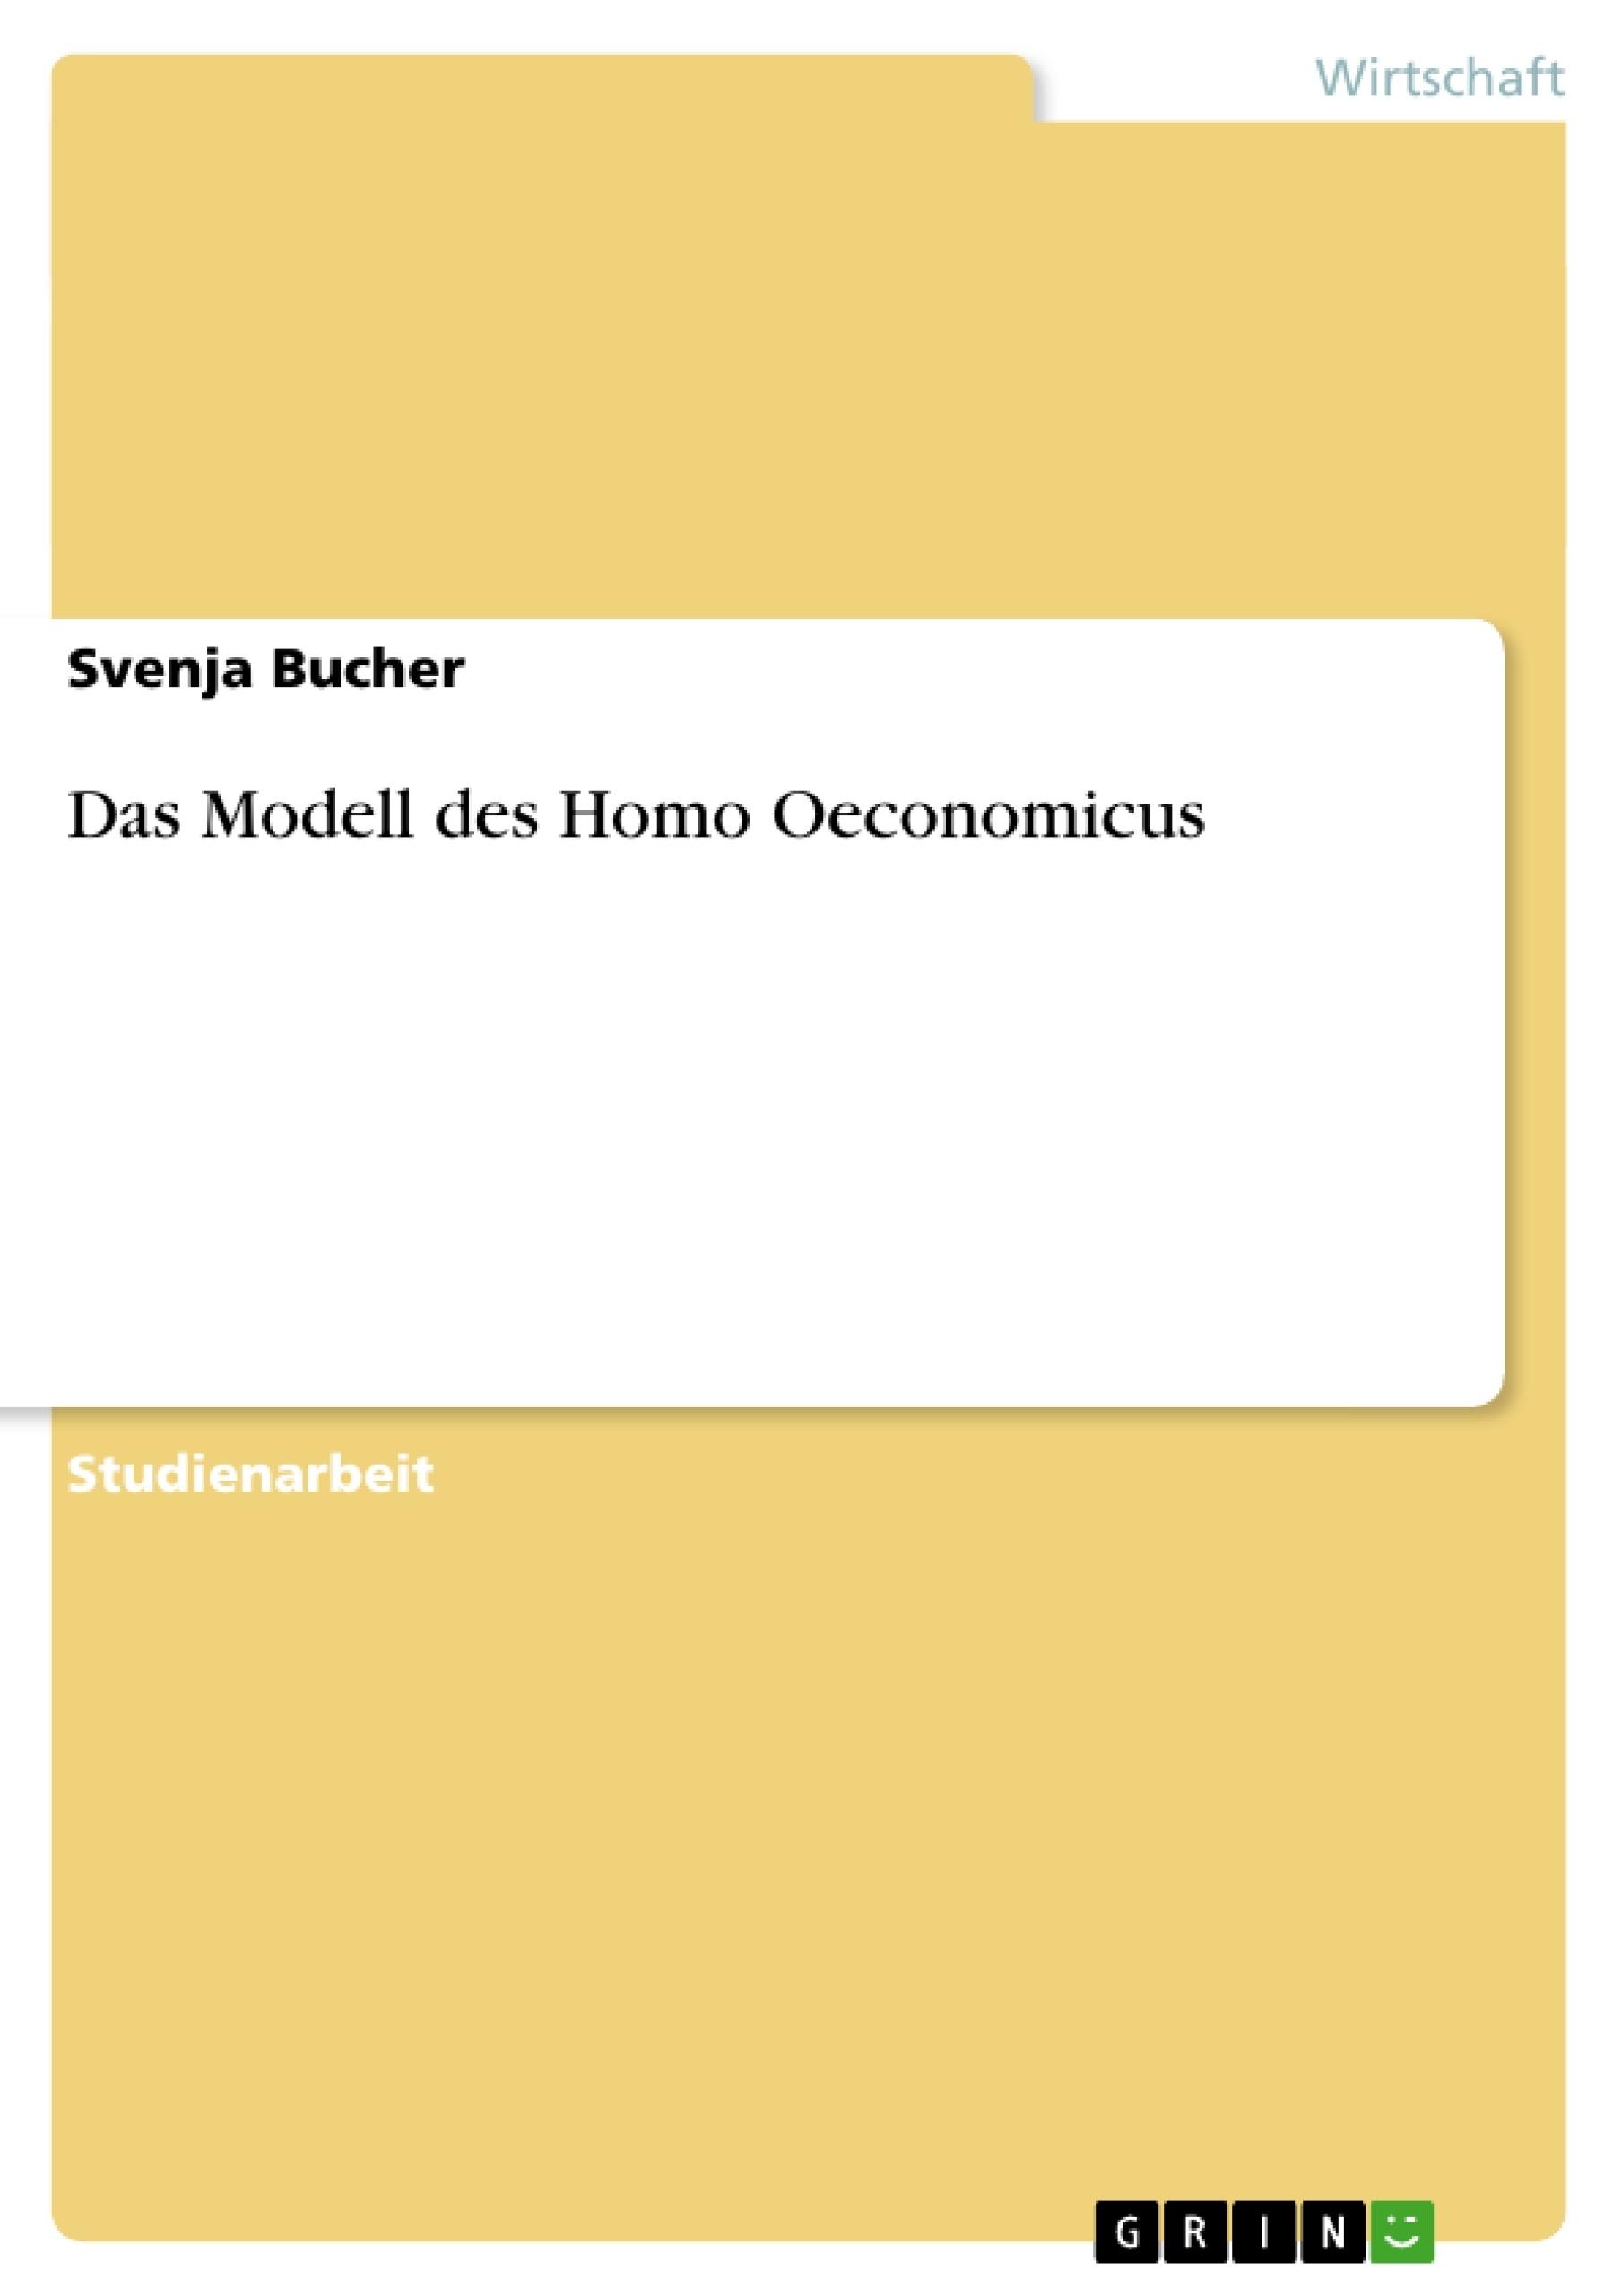 Titel: Das Modell des Homo Oeconomicus